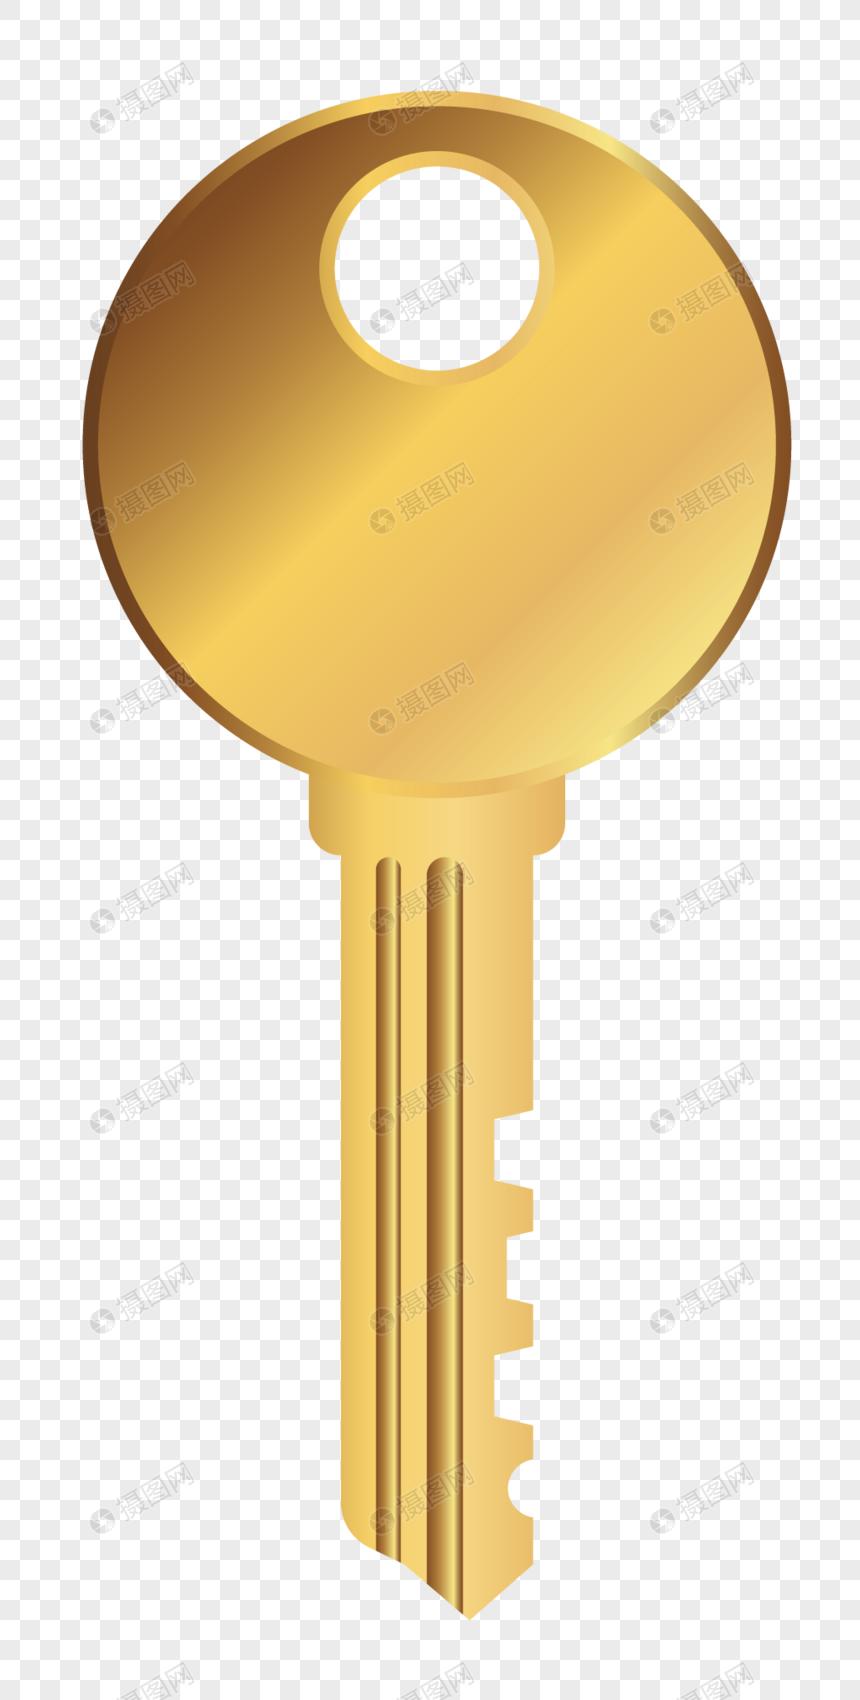 golden key images free